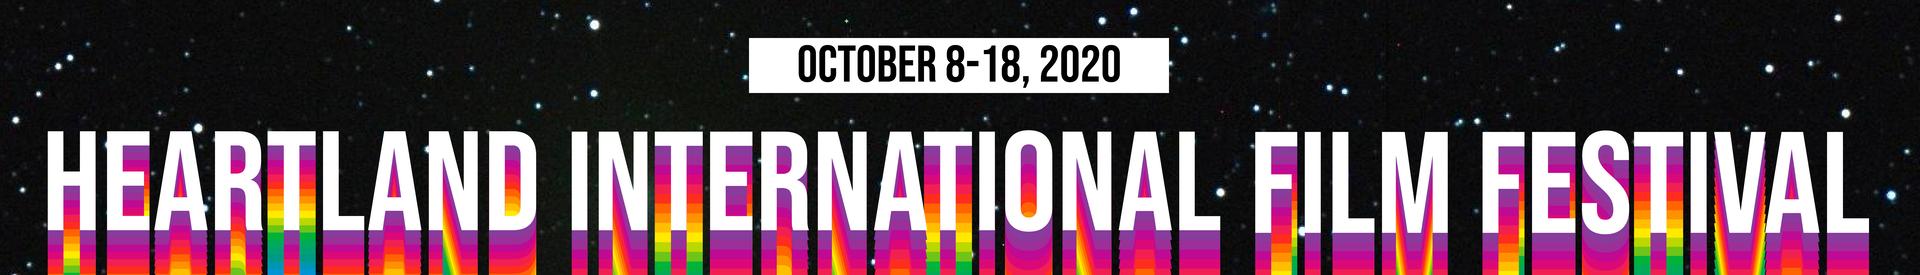 2020 Heartland International Film Festival